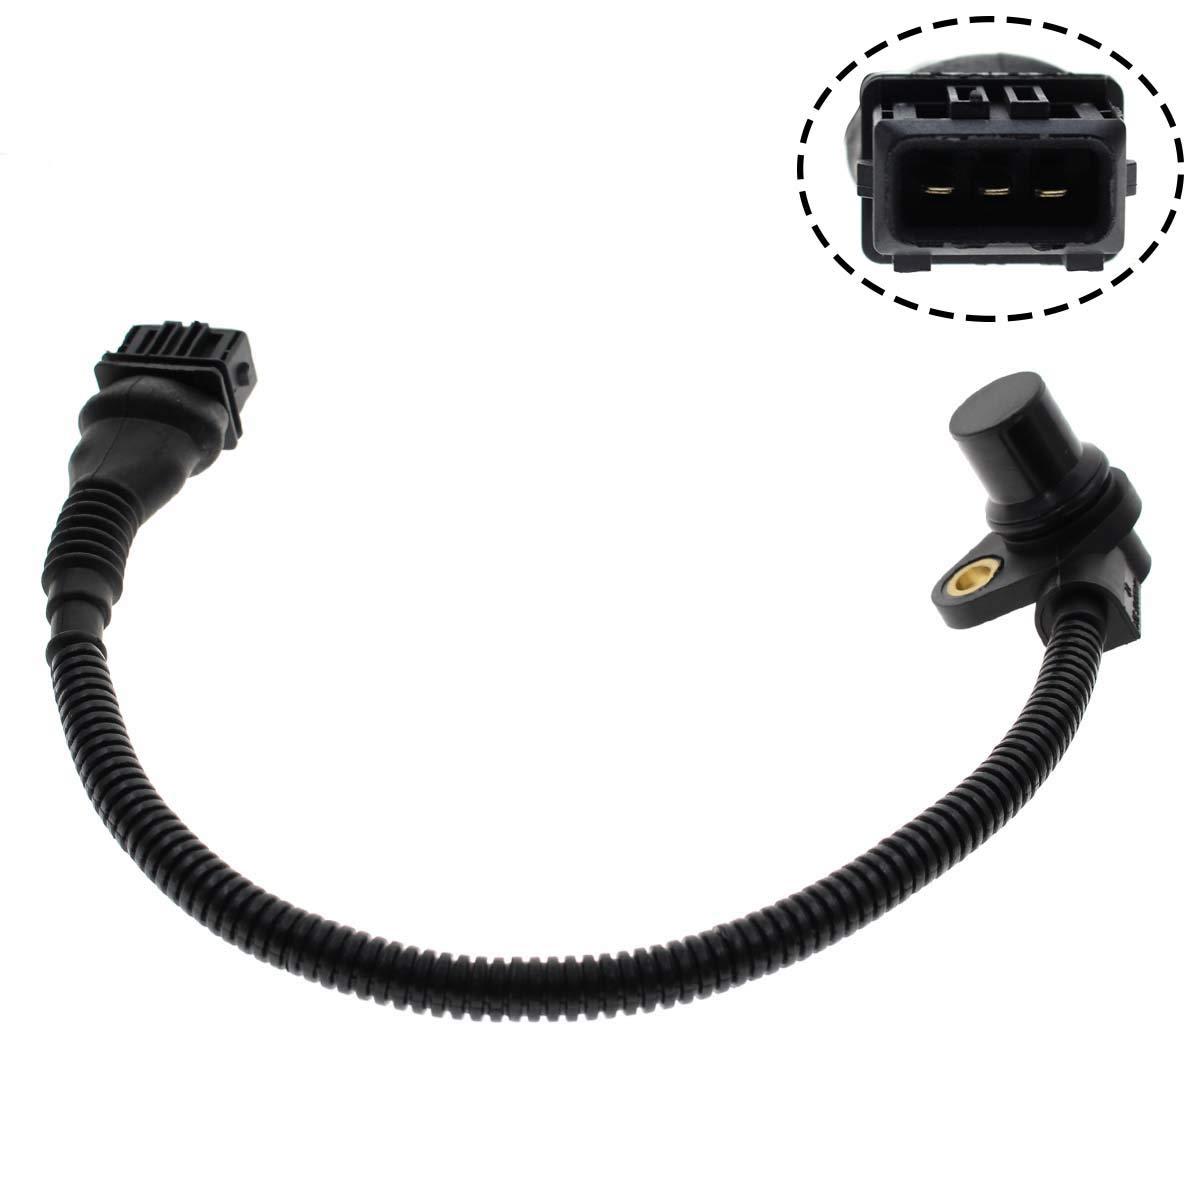 AUTOKAY CVT Transmission Rotational Speed Sensor for Mini Cooper R50/52 1.6L 24357518732 by AUTOKAY